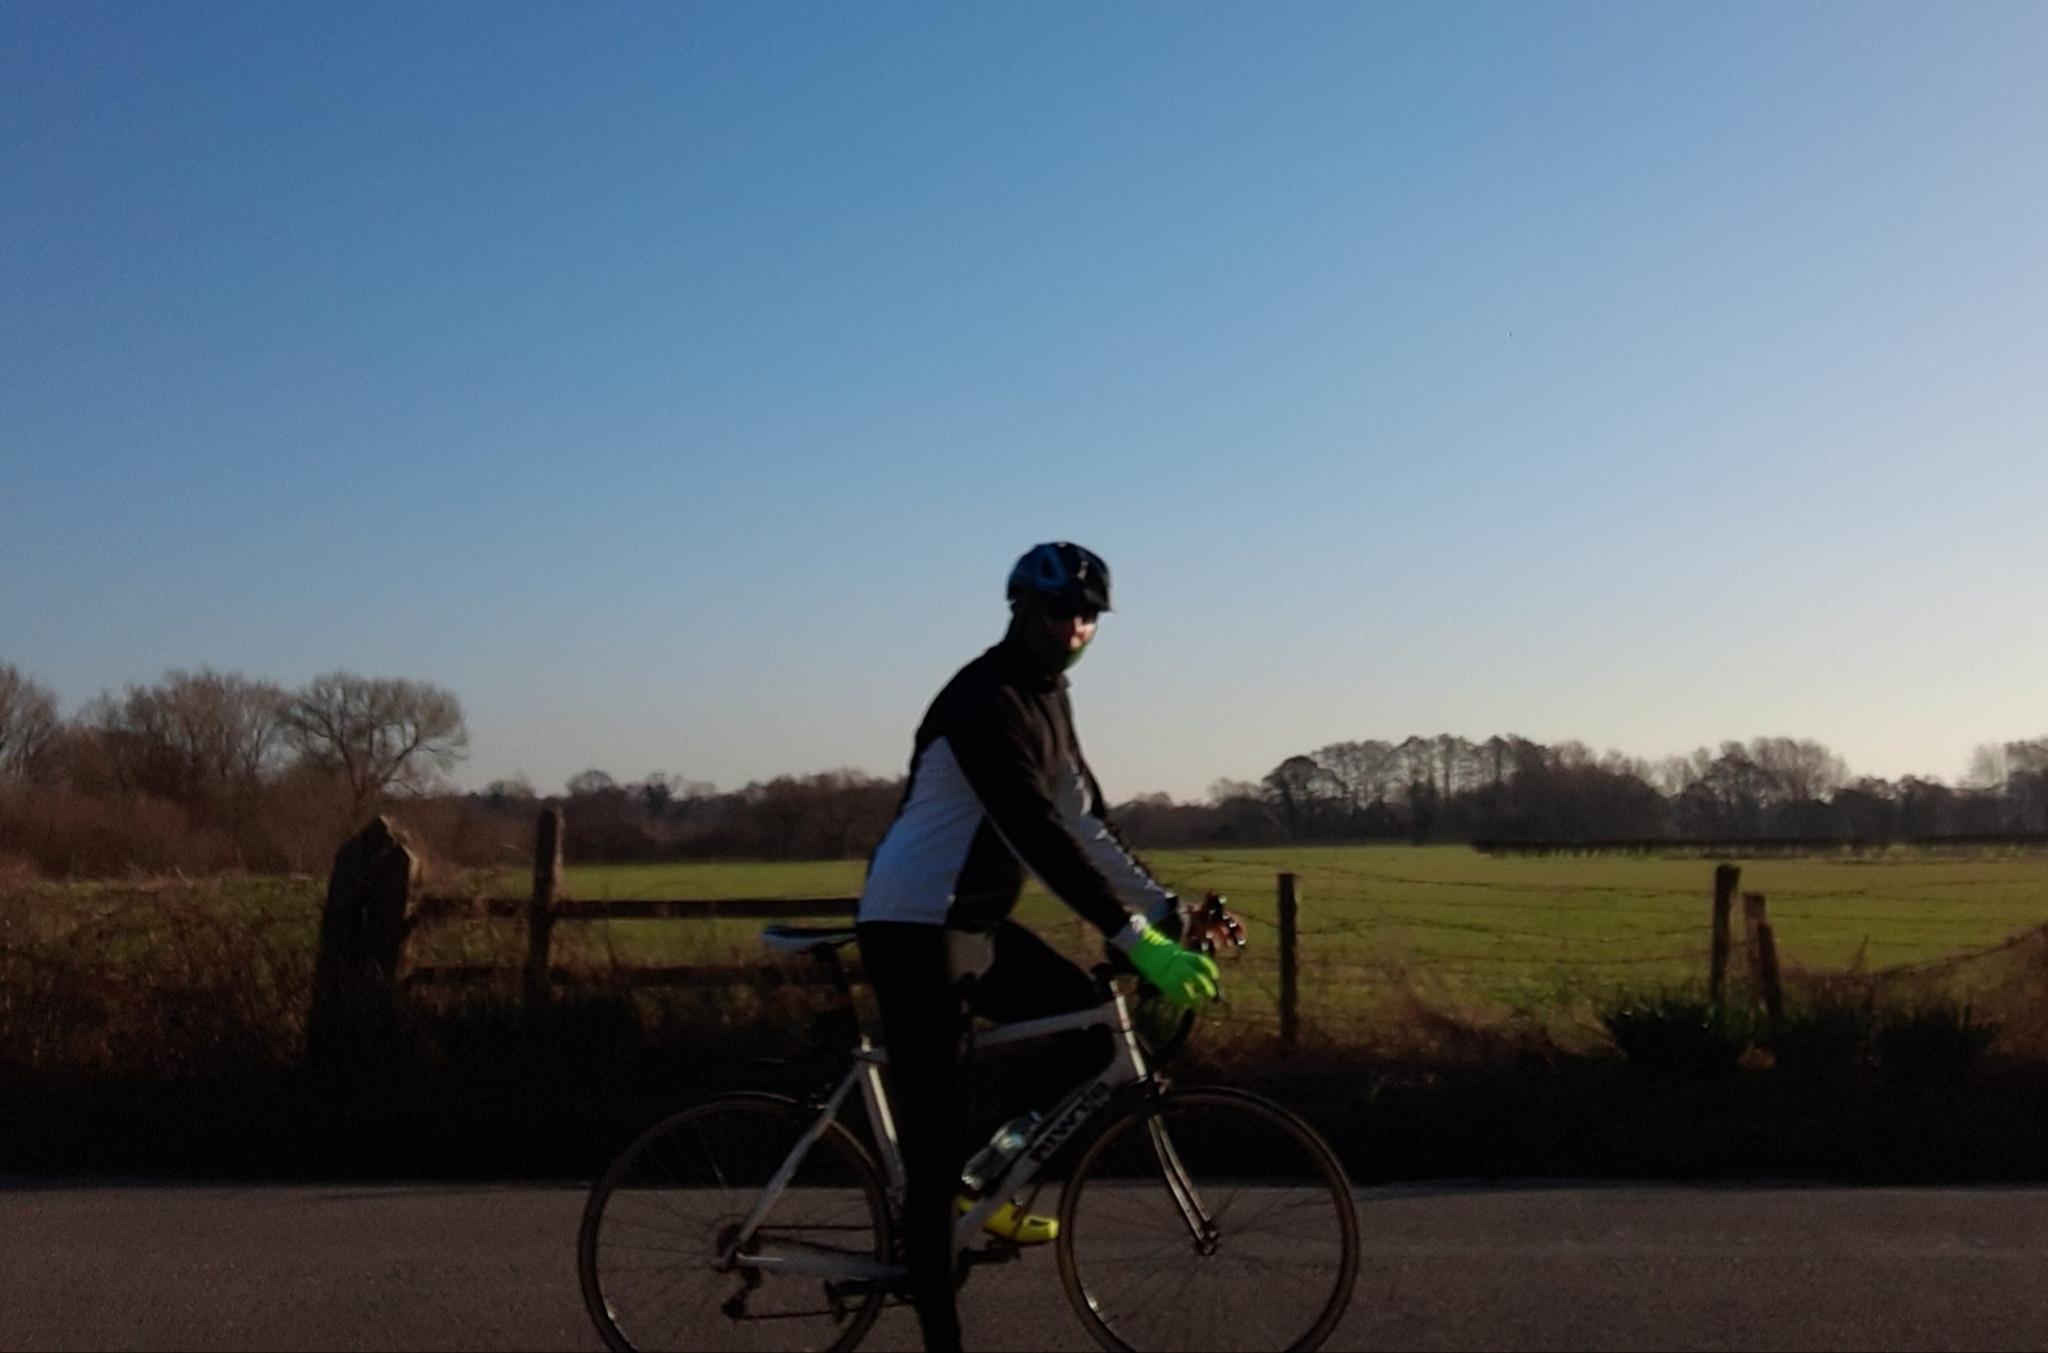 On my bike-20210301_173102-jpg